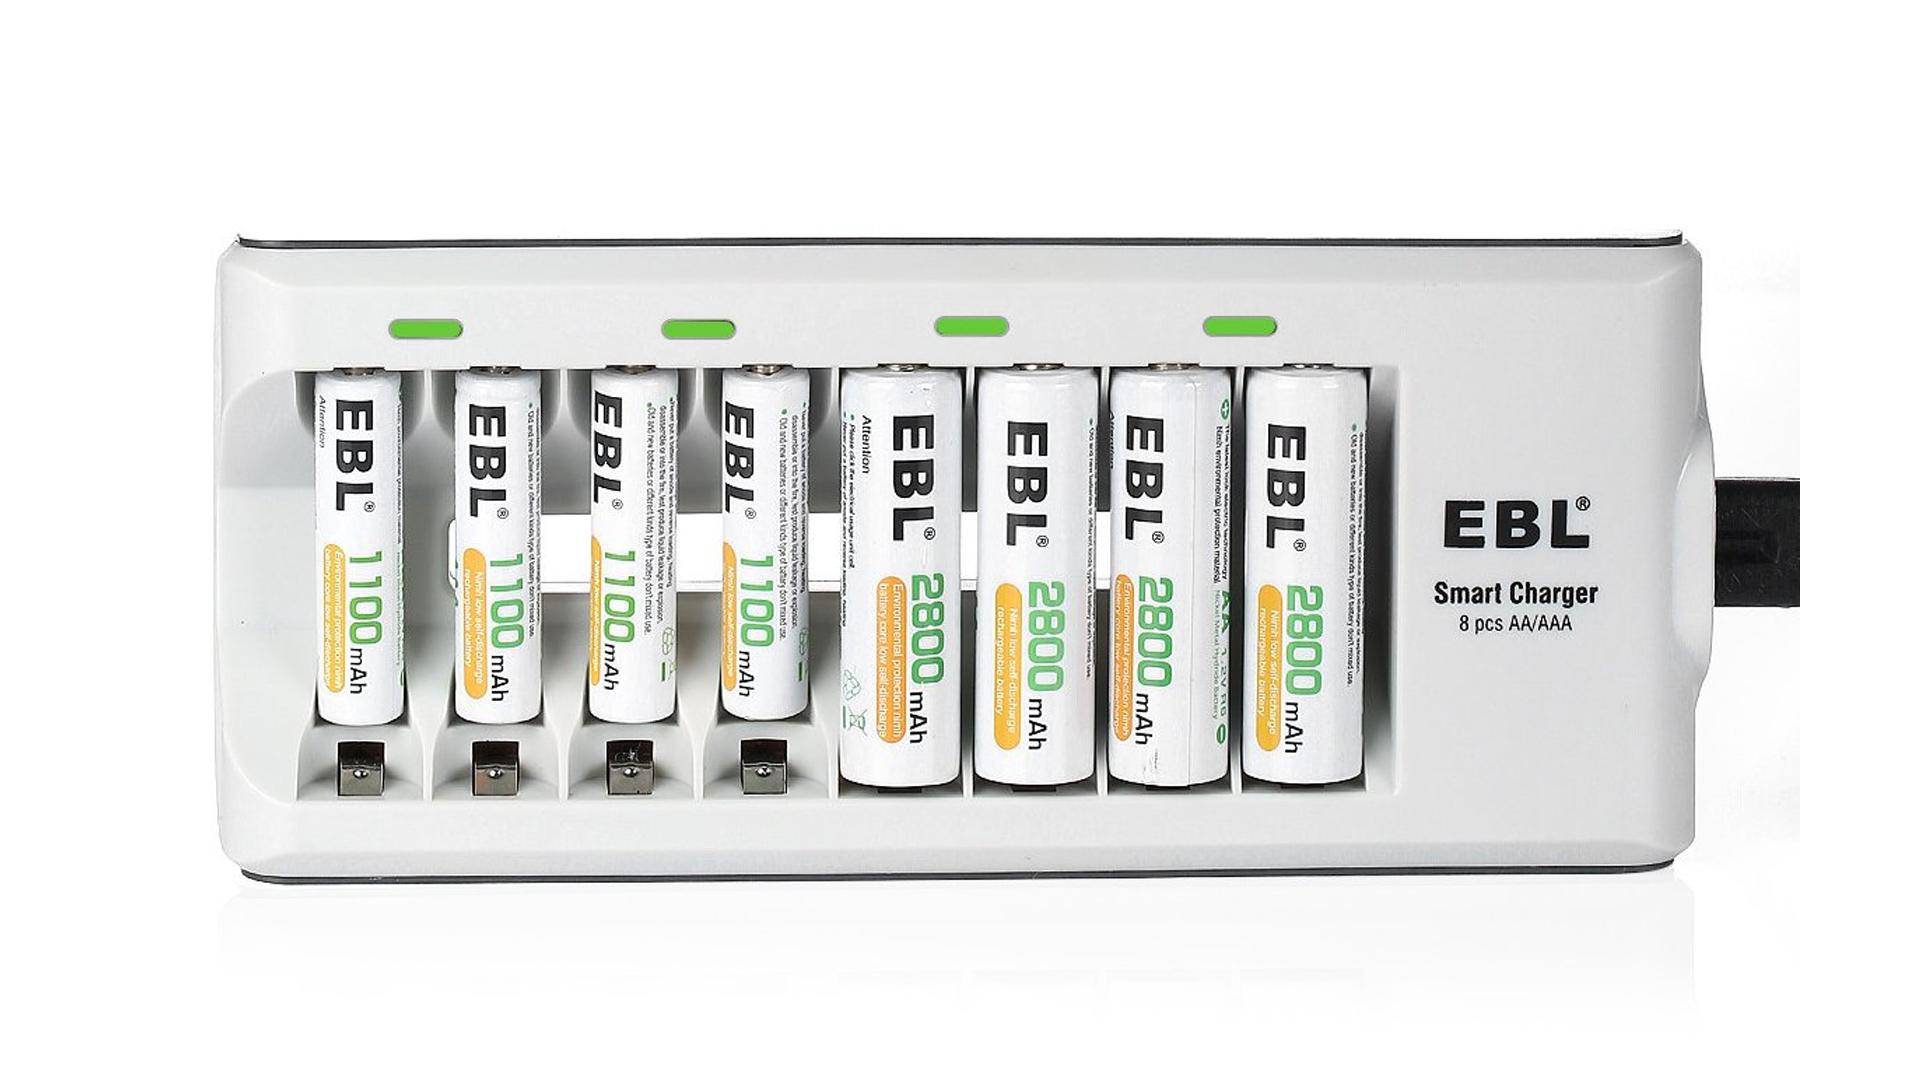 The EBL 8-bay AA and AAA charging bay.